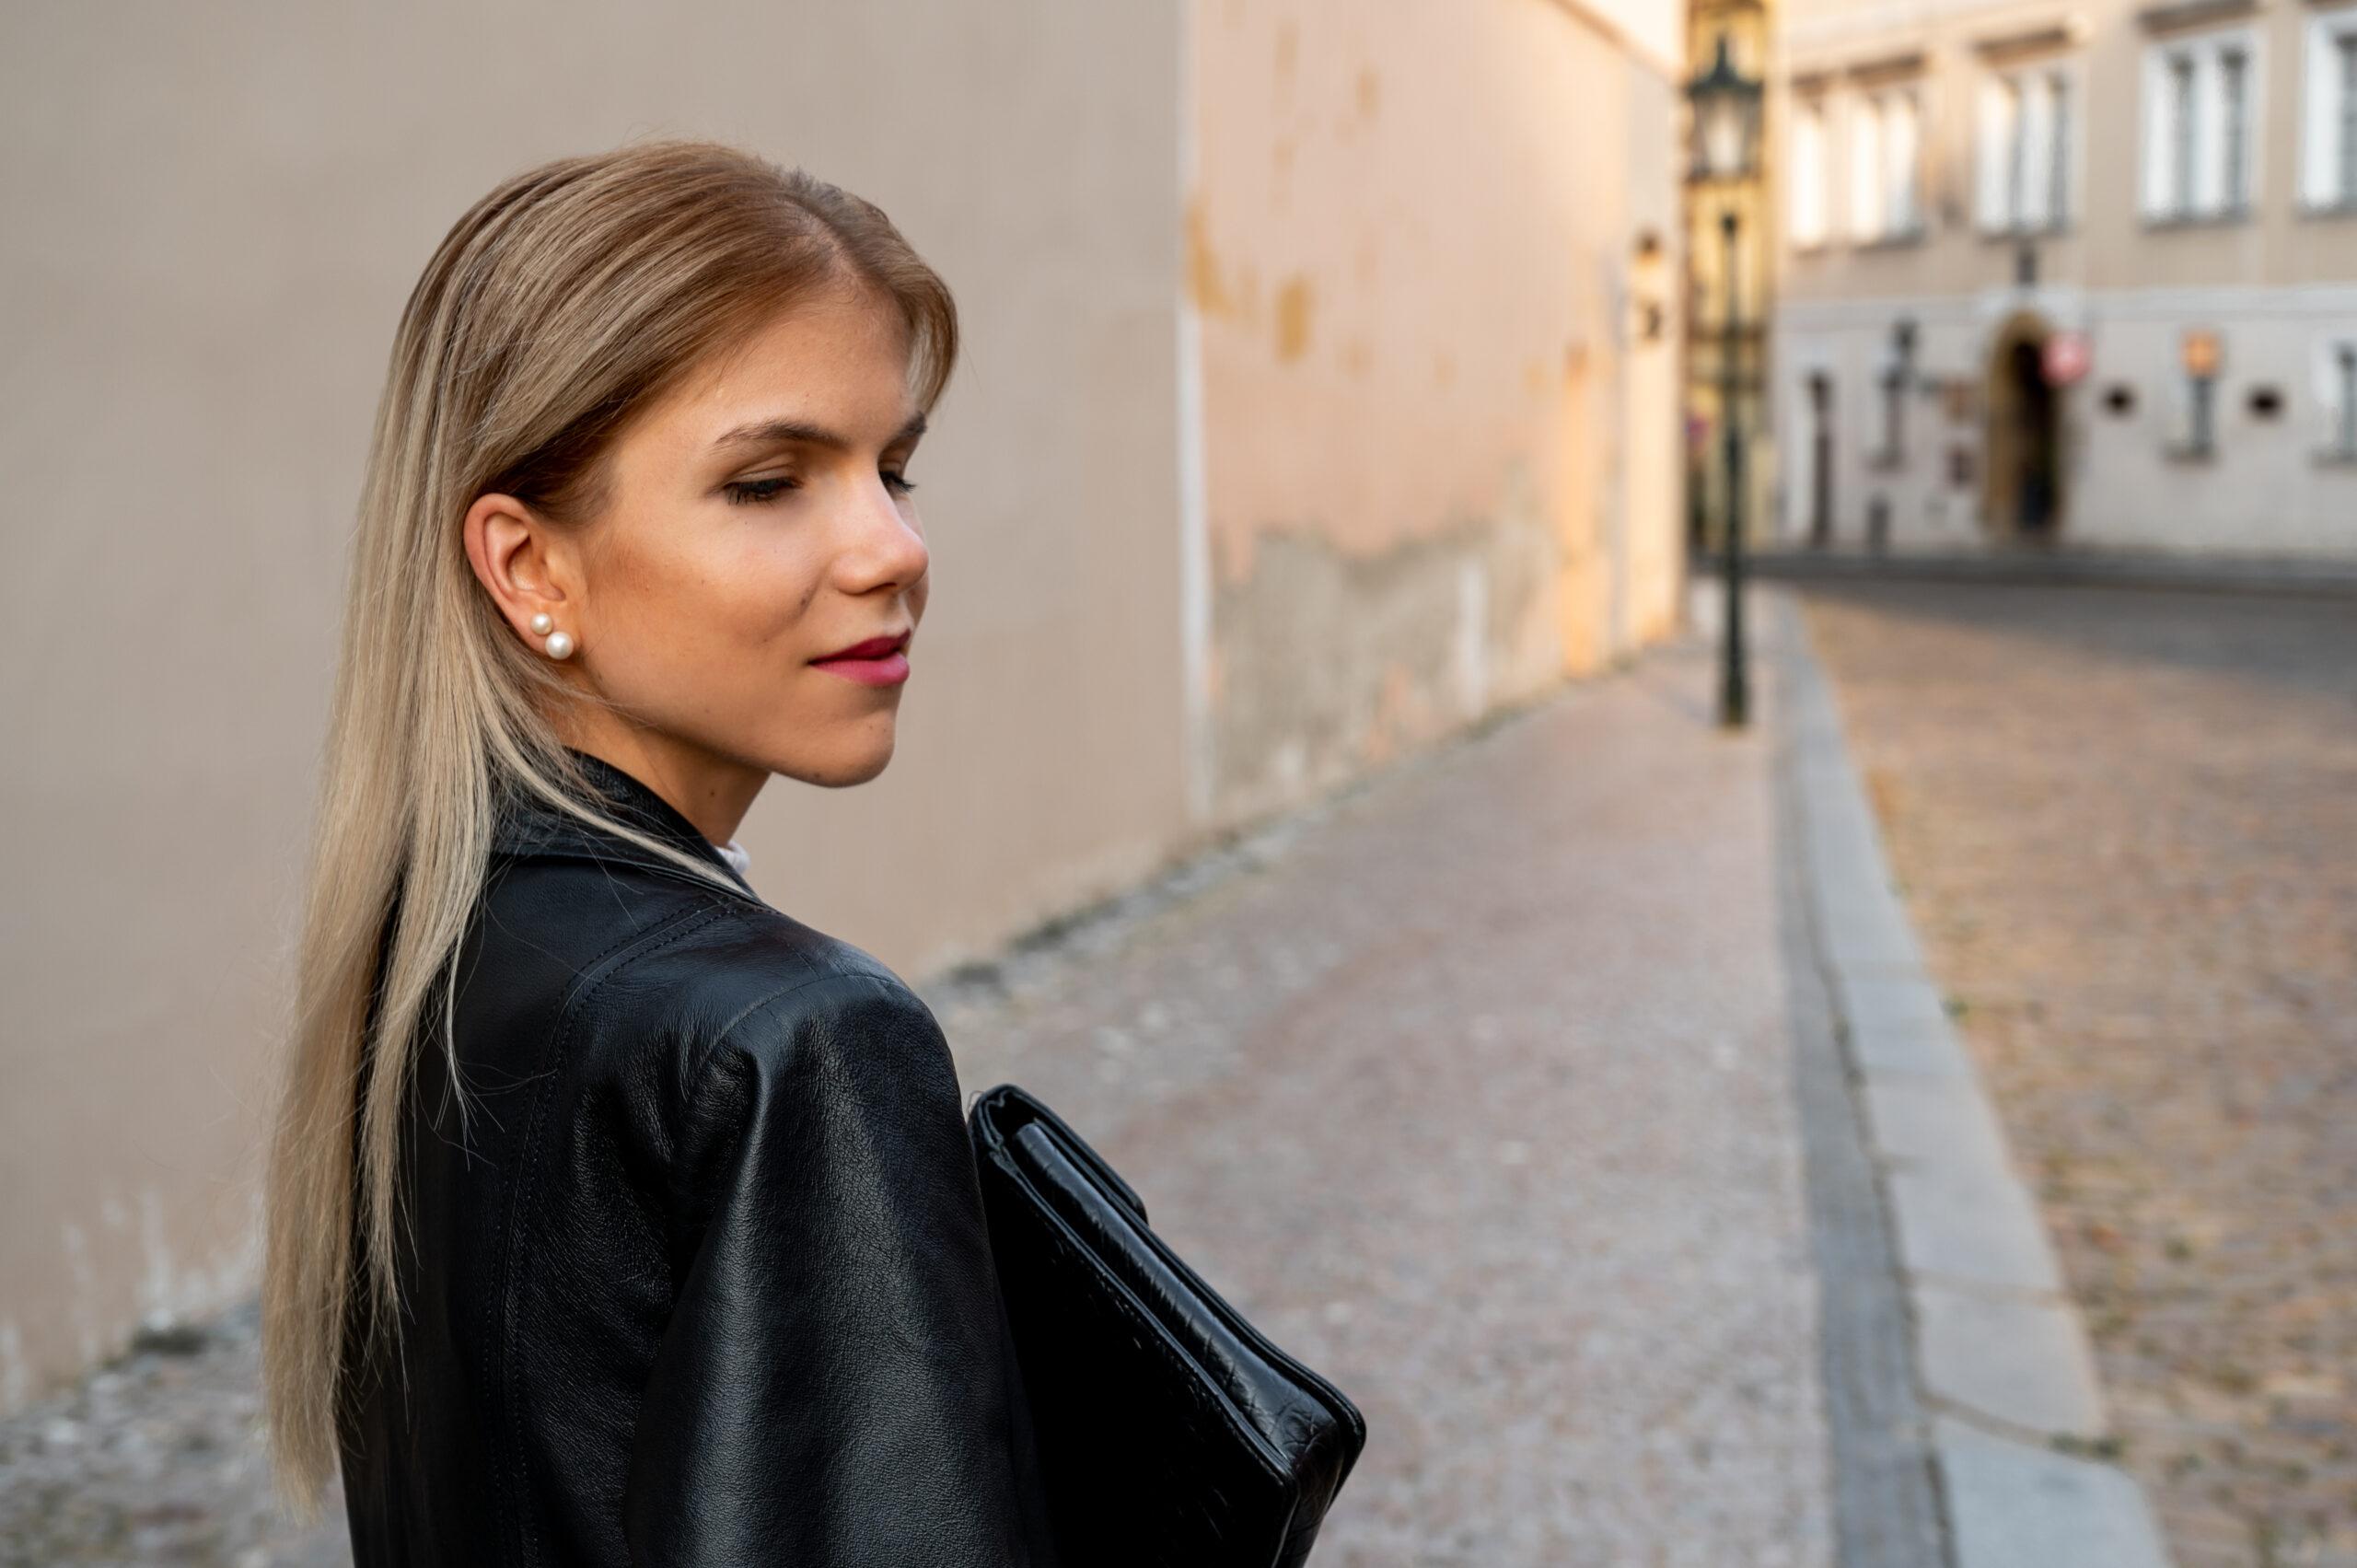 Bc. Veronika Tázlerová